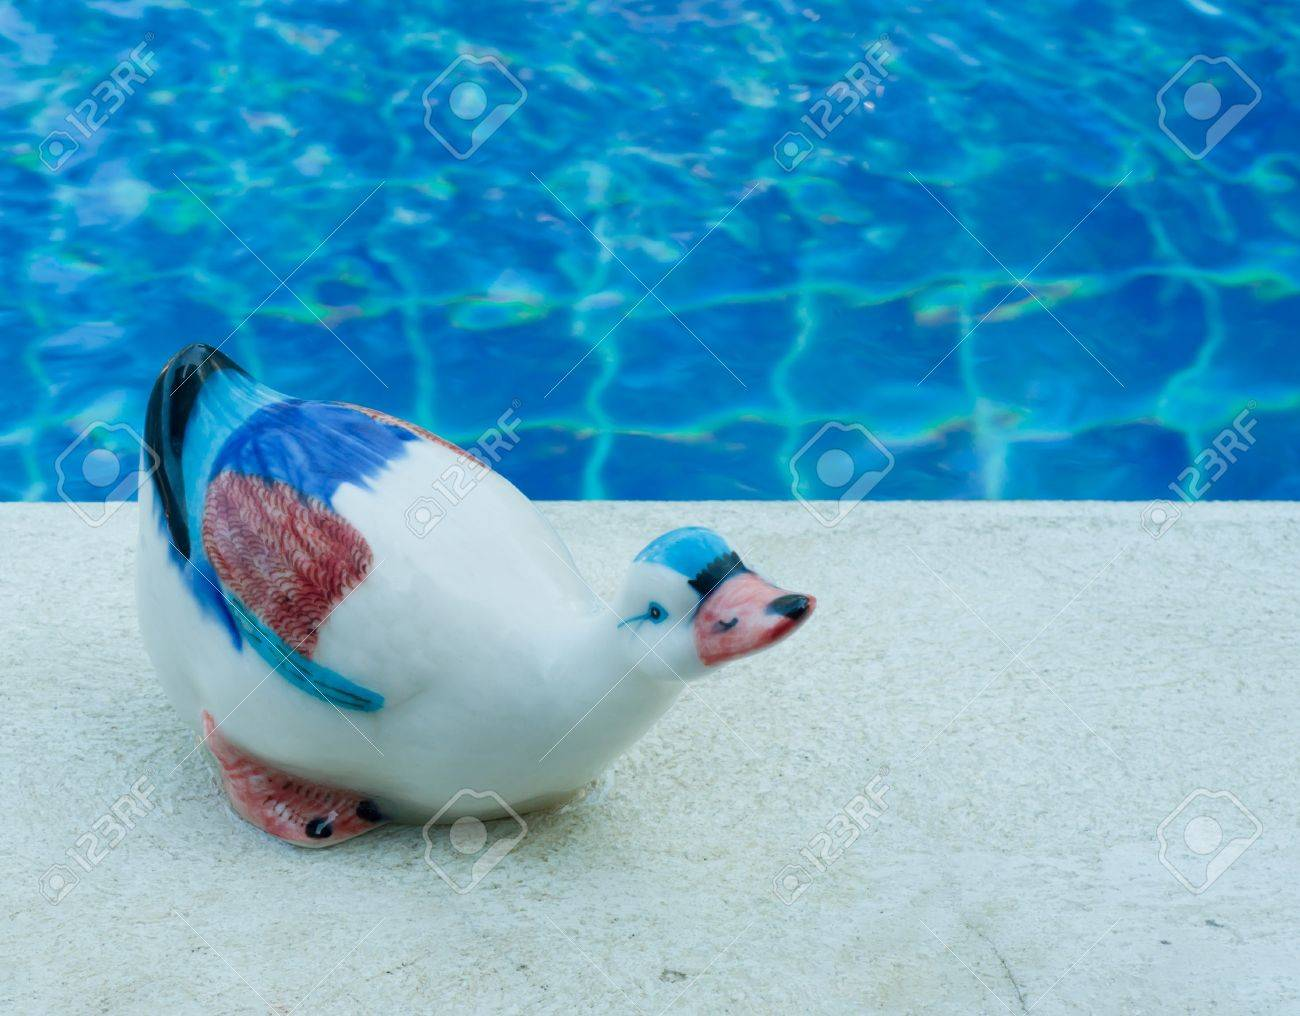 ceramic duck on swimming pool edge Stock Photo - 11709166